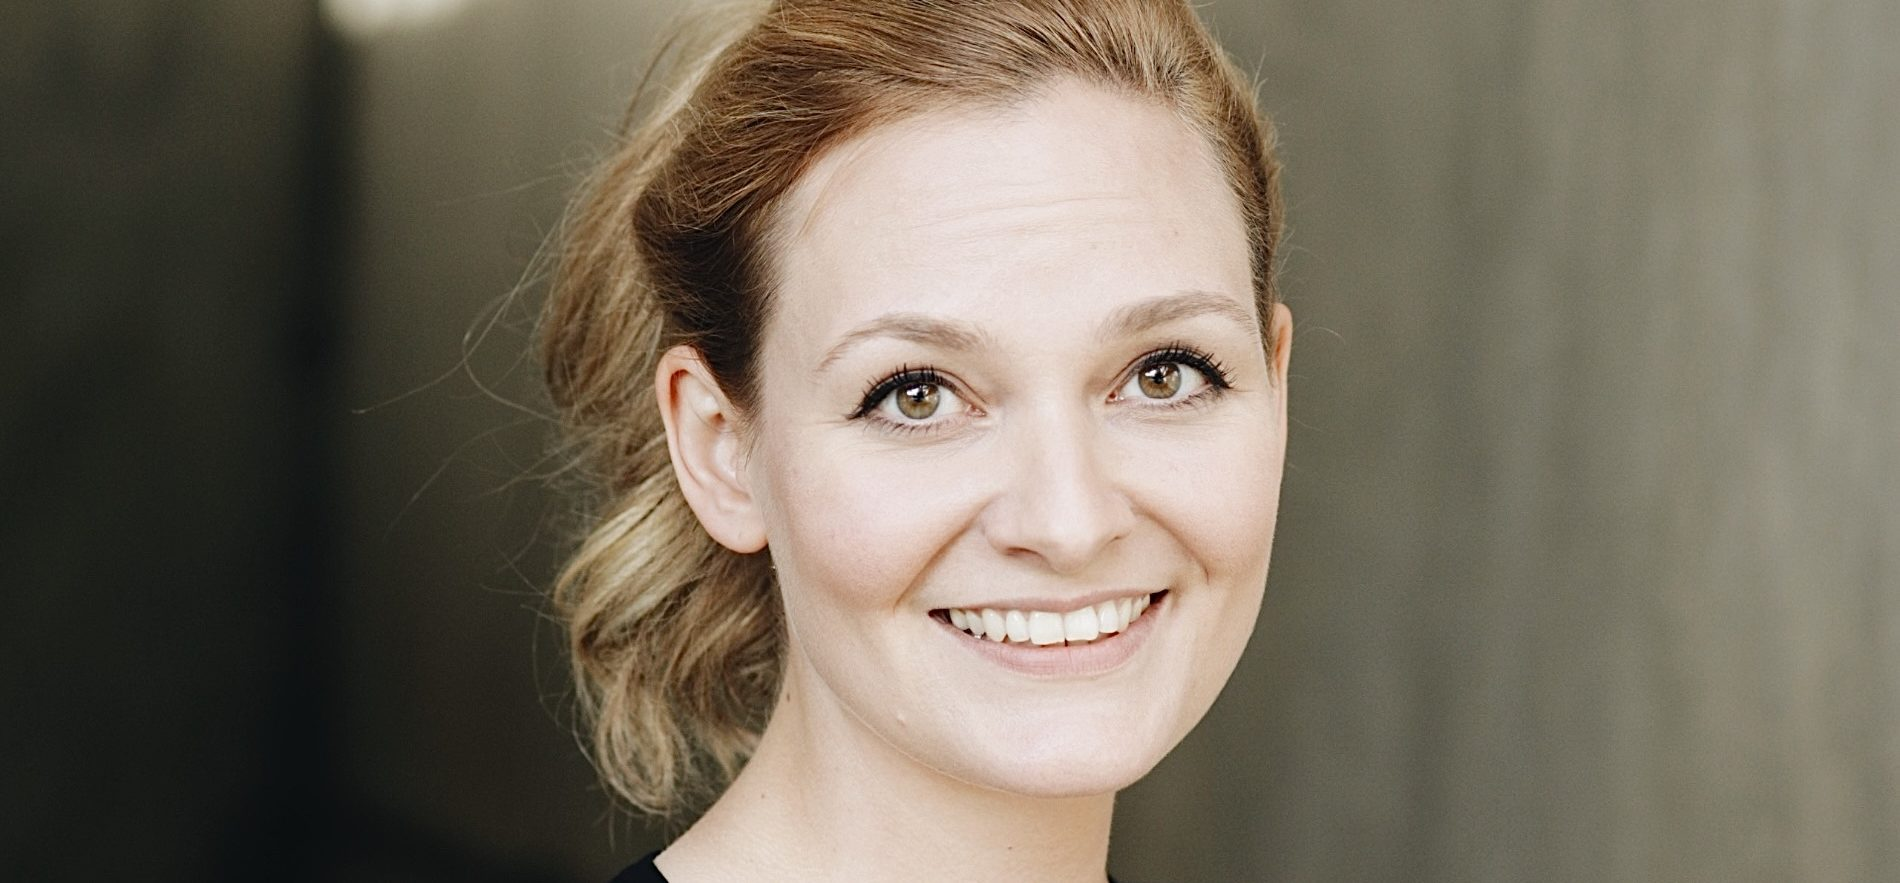 Nina-Carissima Schönrock, Sprecherin, Moderatorin, TV-Moderatorin, Synchronsprecherin, Sprecherin in München, Moderatorin in München